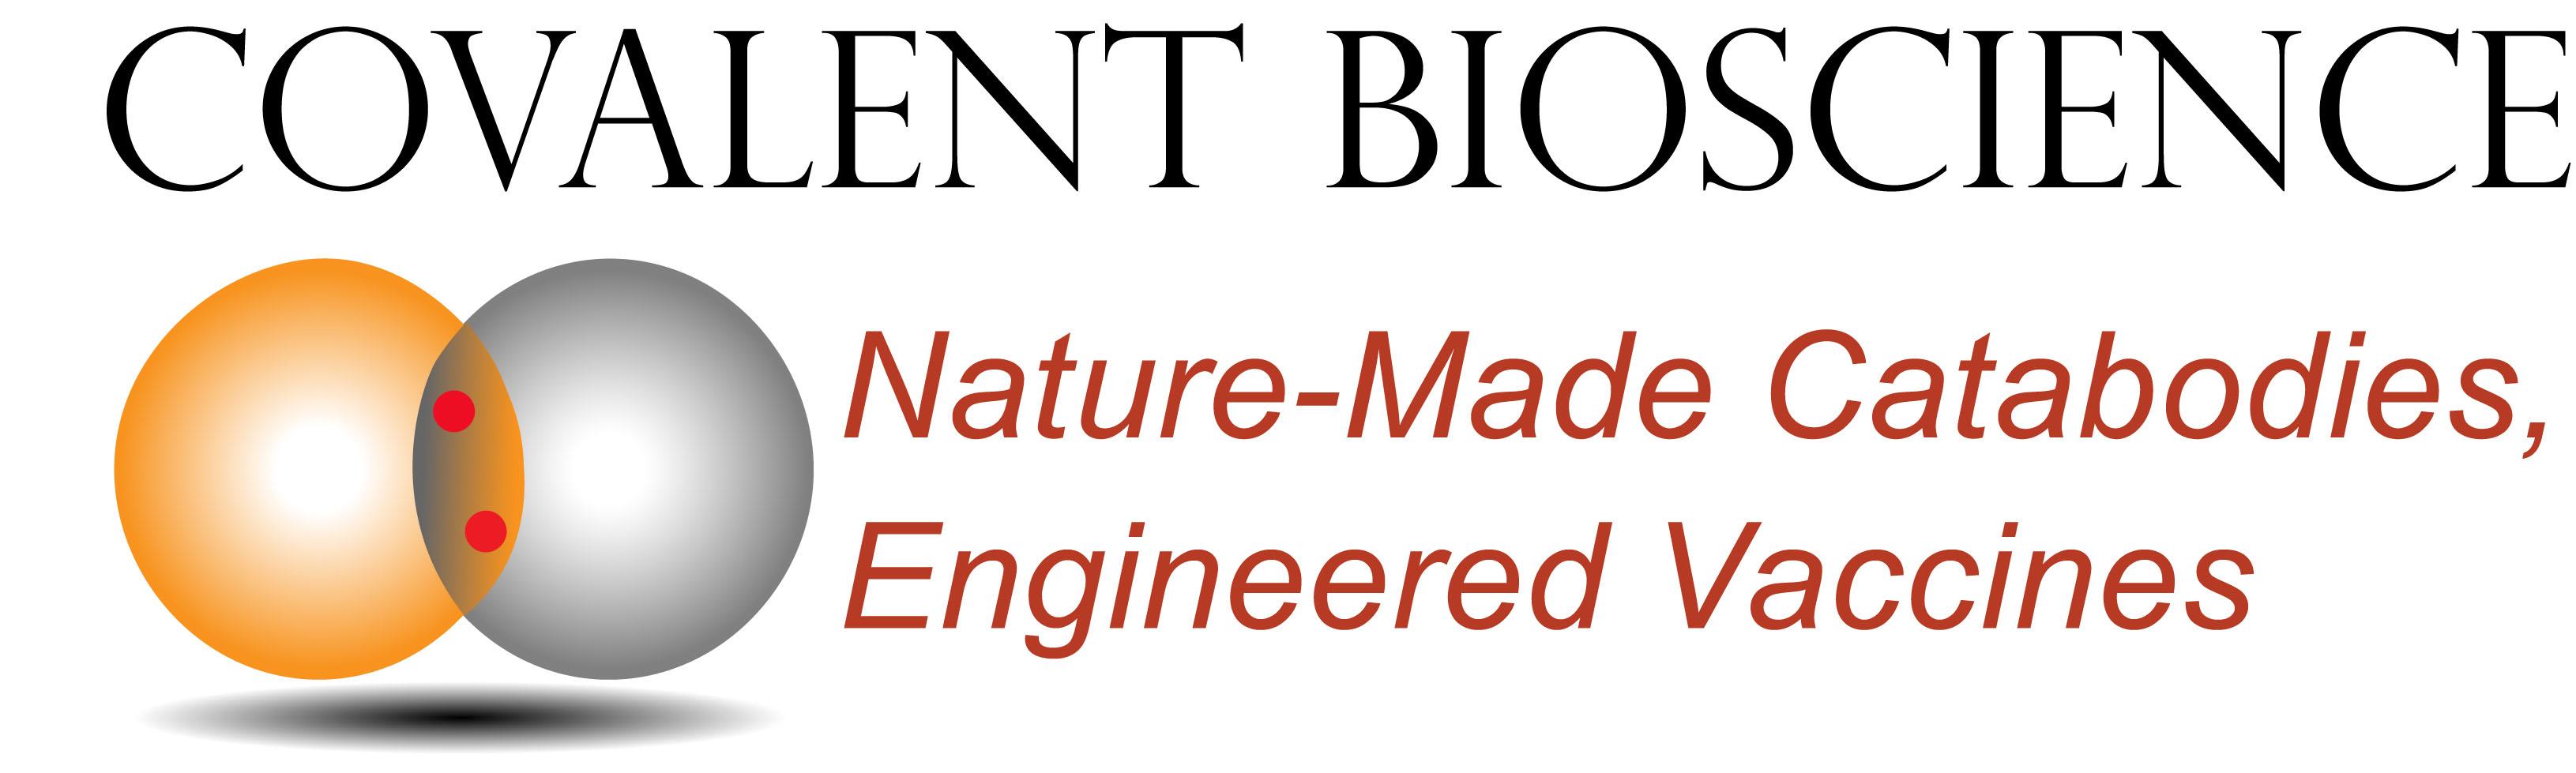 Covalent Bioscience